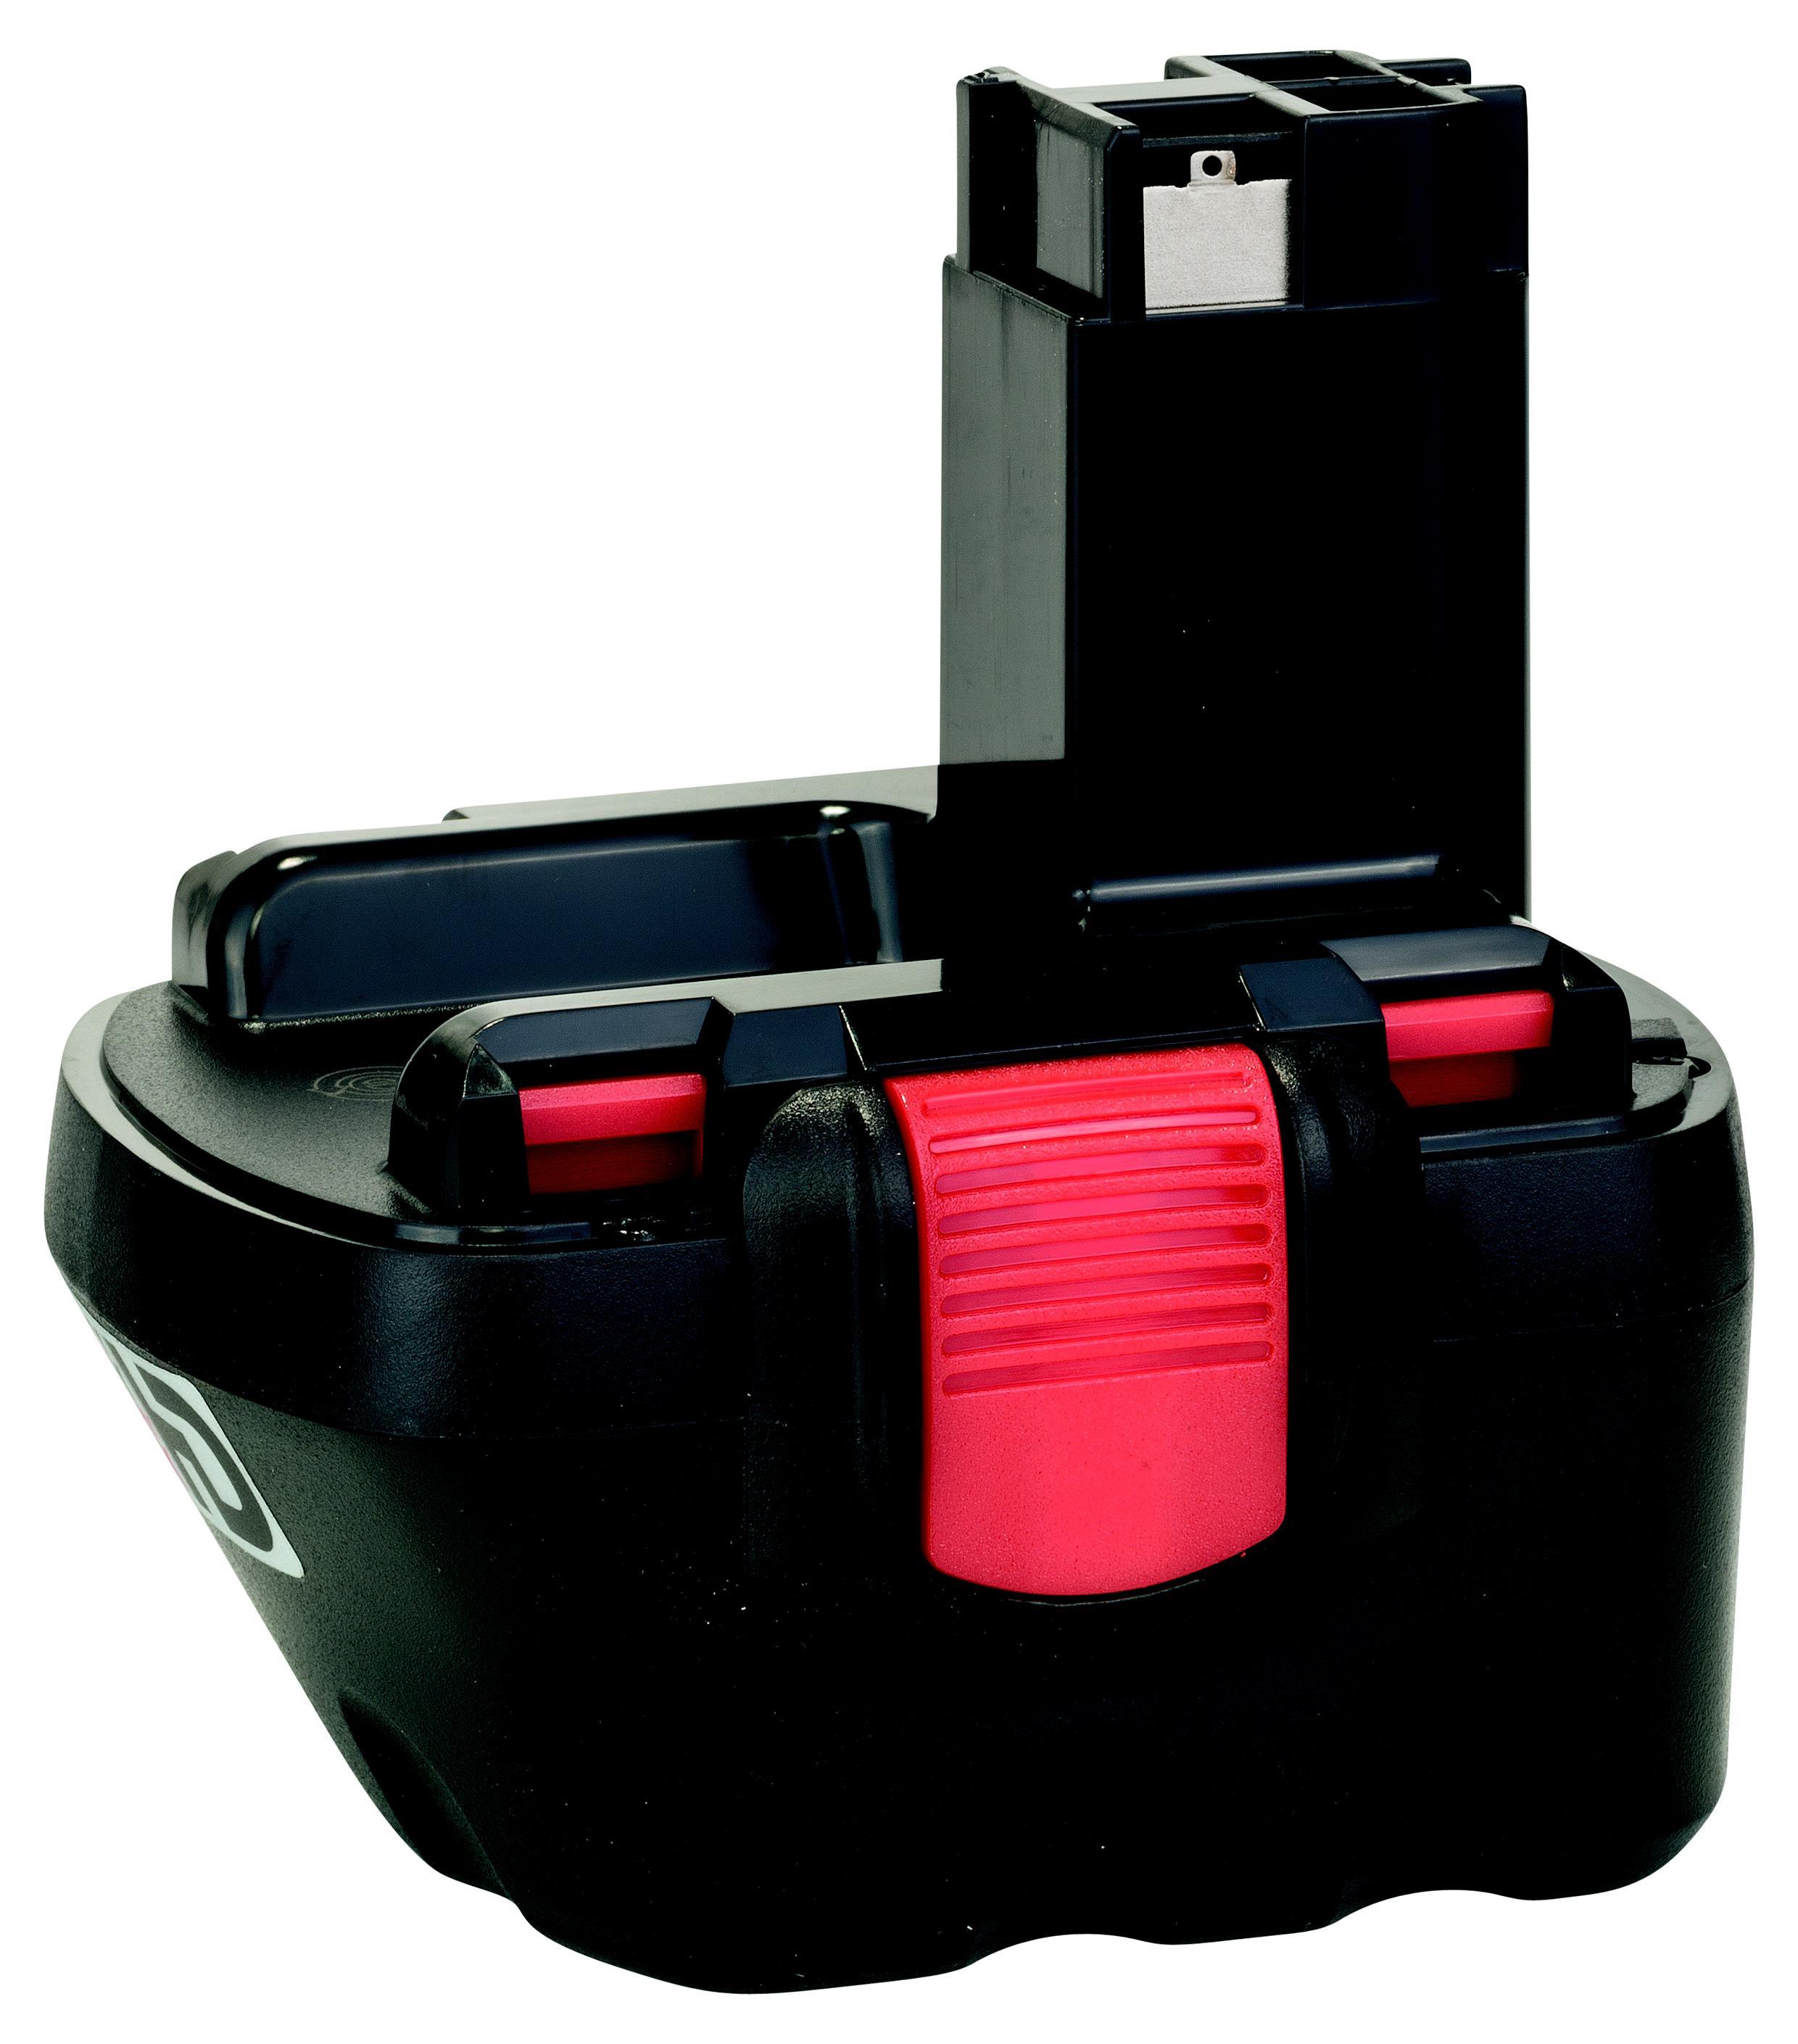 Фото - Аккумулятор Bosch 12.0В2.6Ач nimh (2.607.335.684) аккумулятор